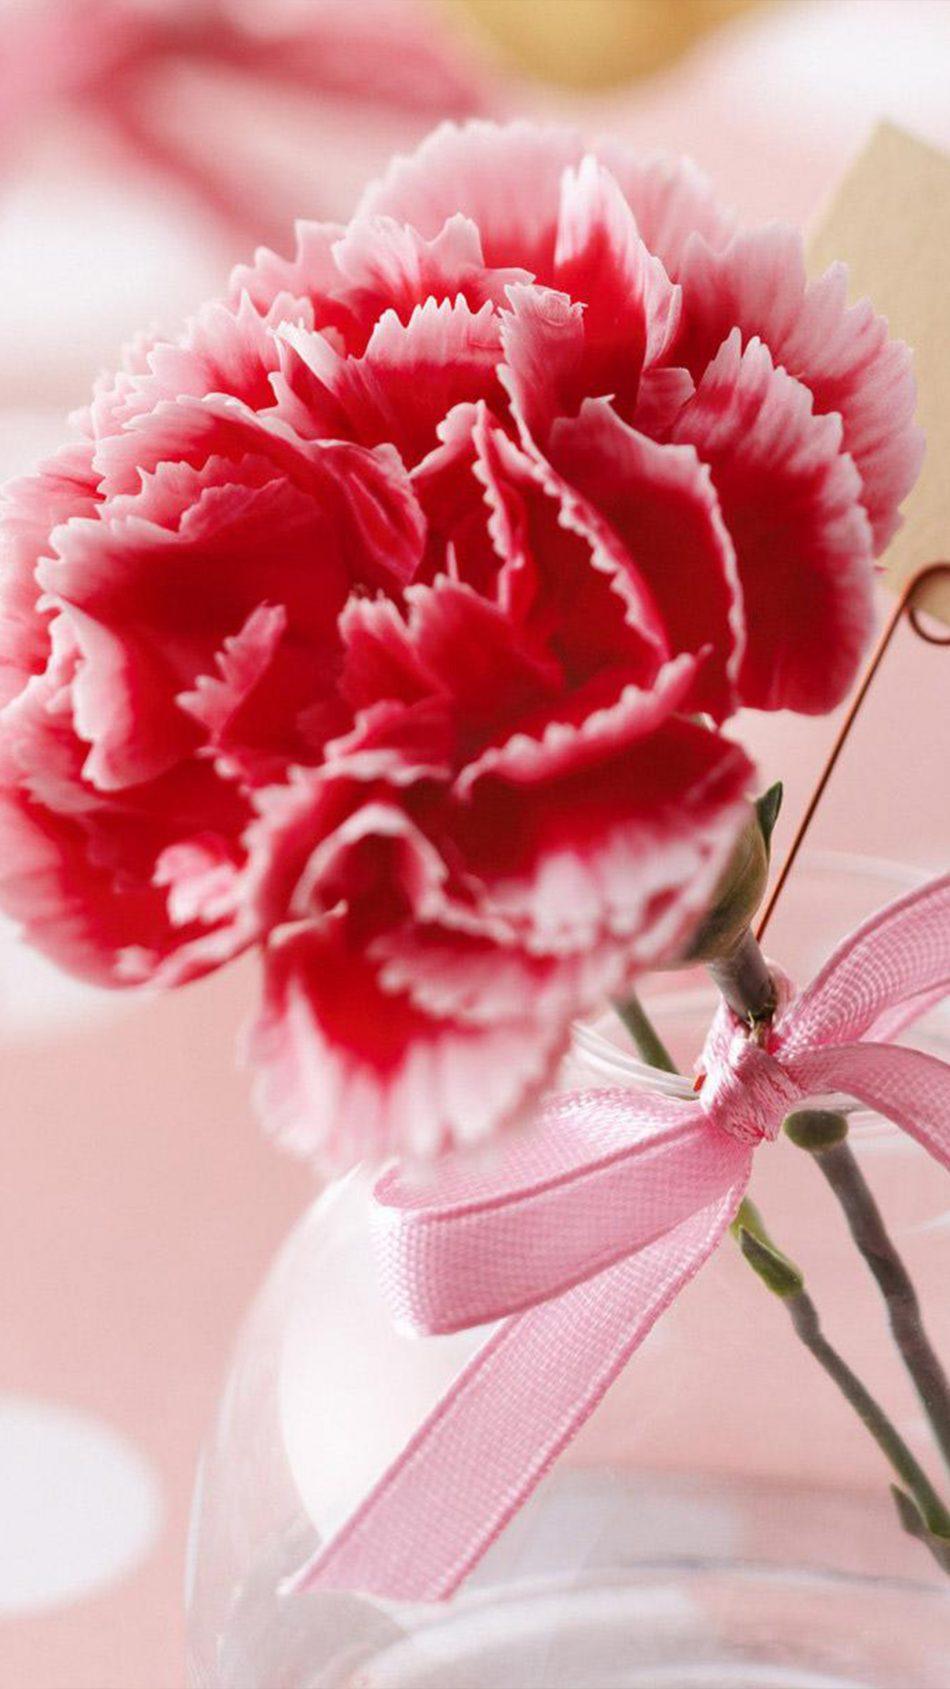 Valentine's Day Flower 4K Ultra HD Mobile Wallpaper